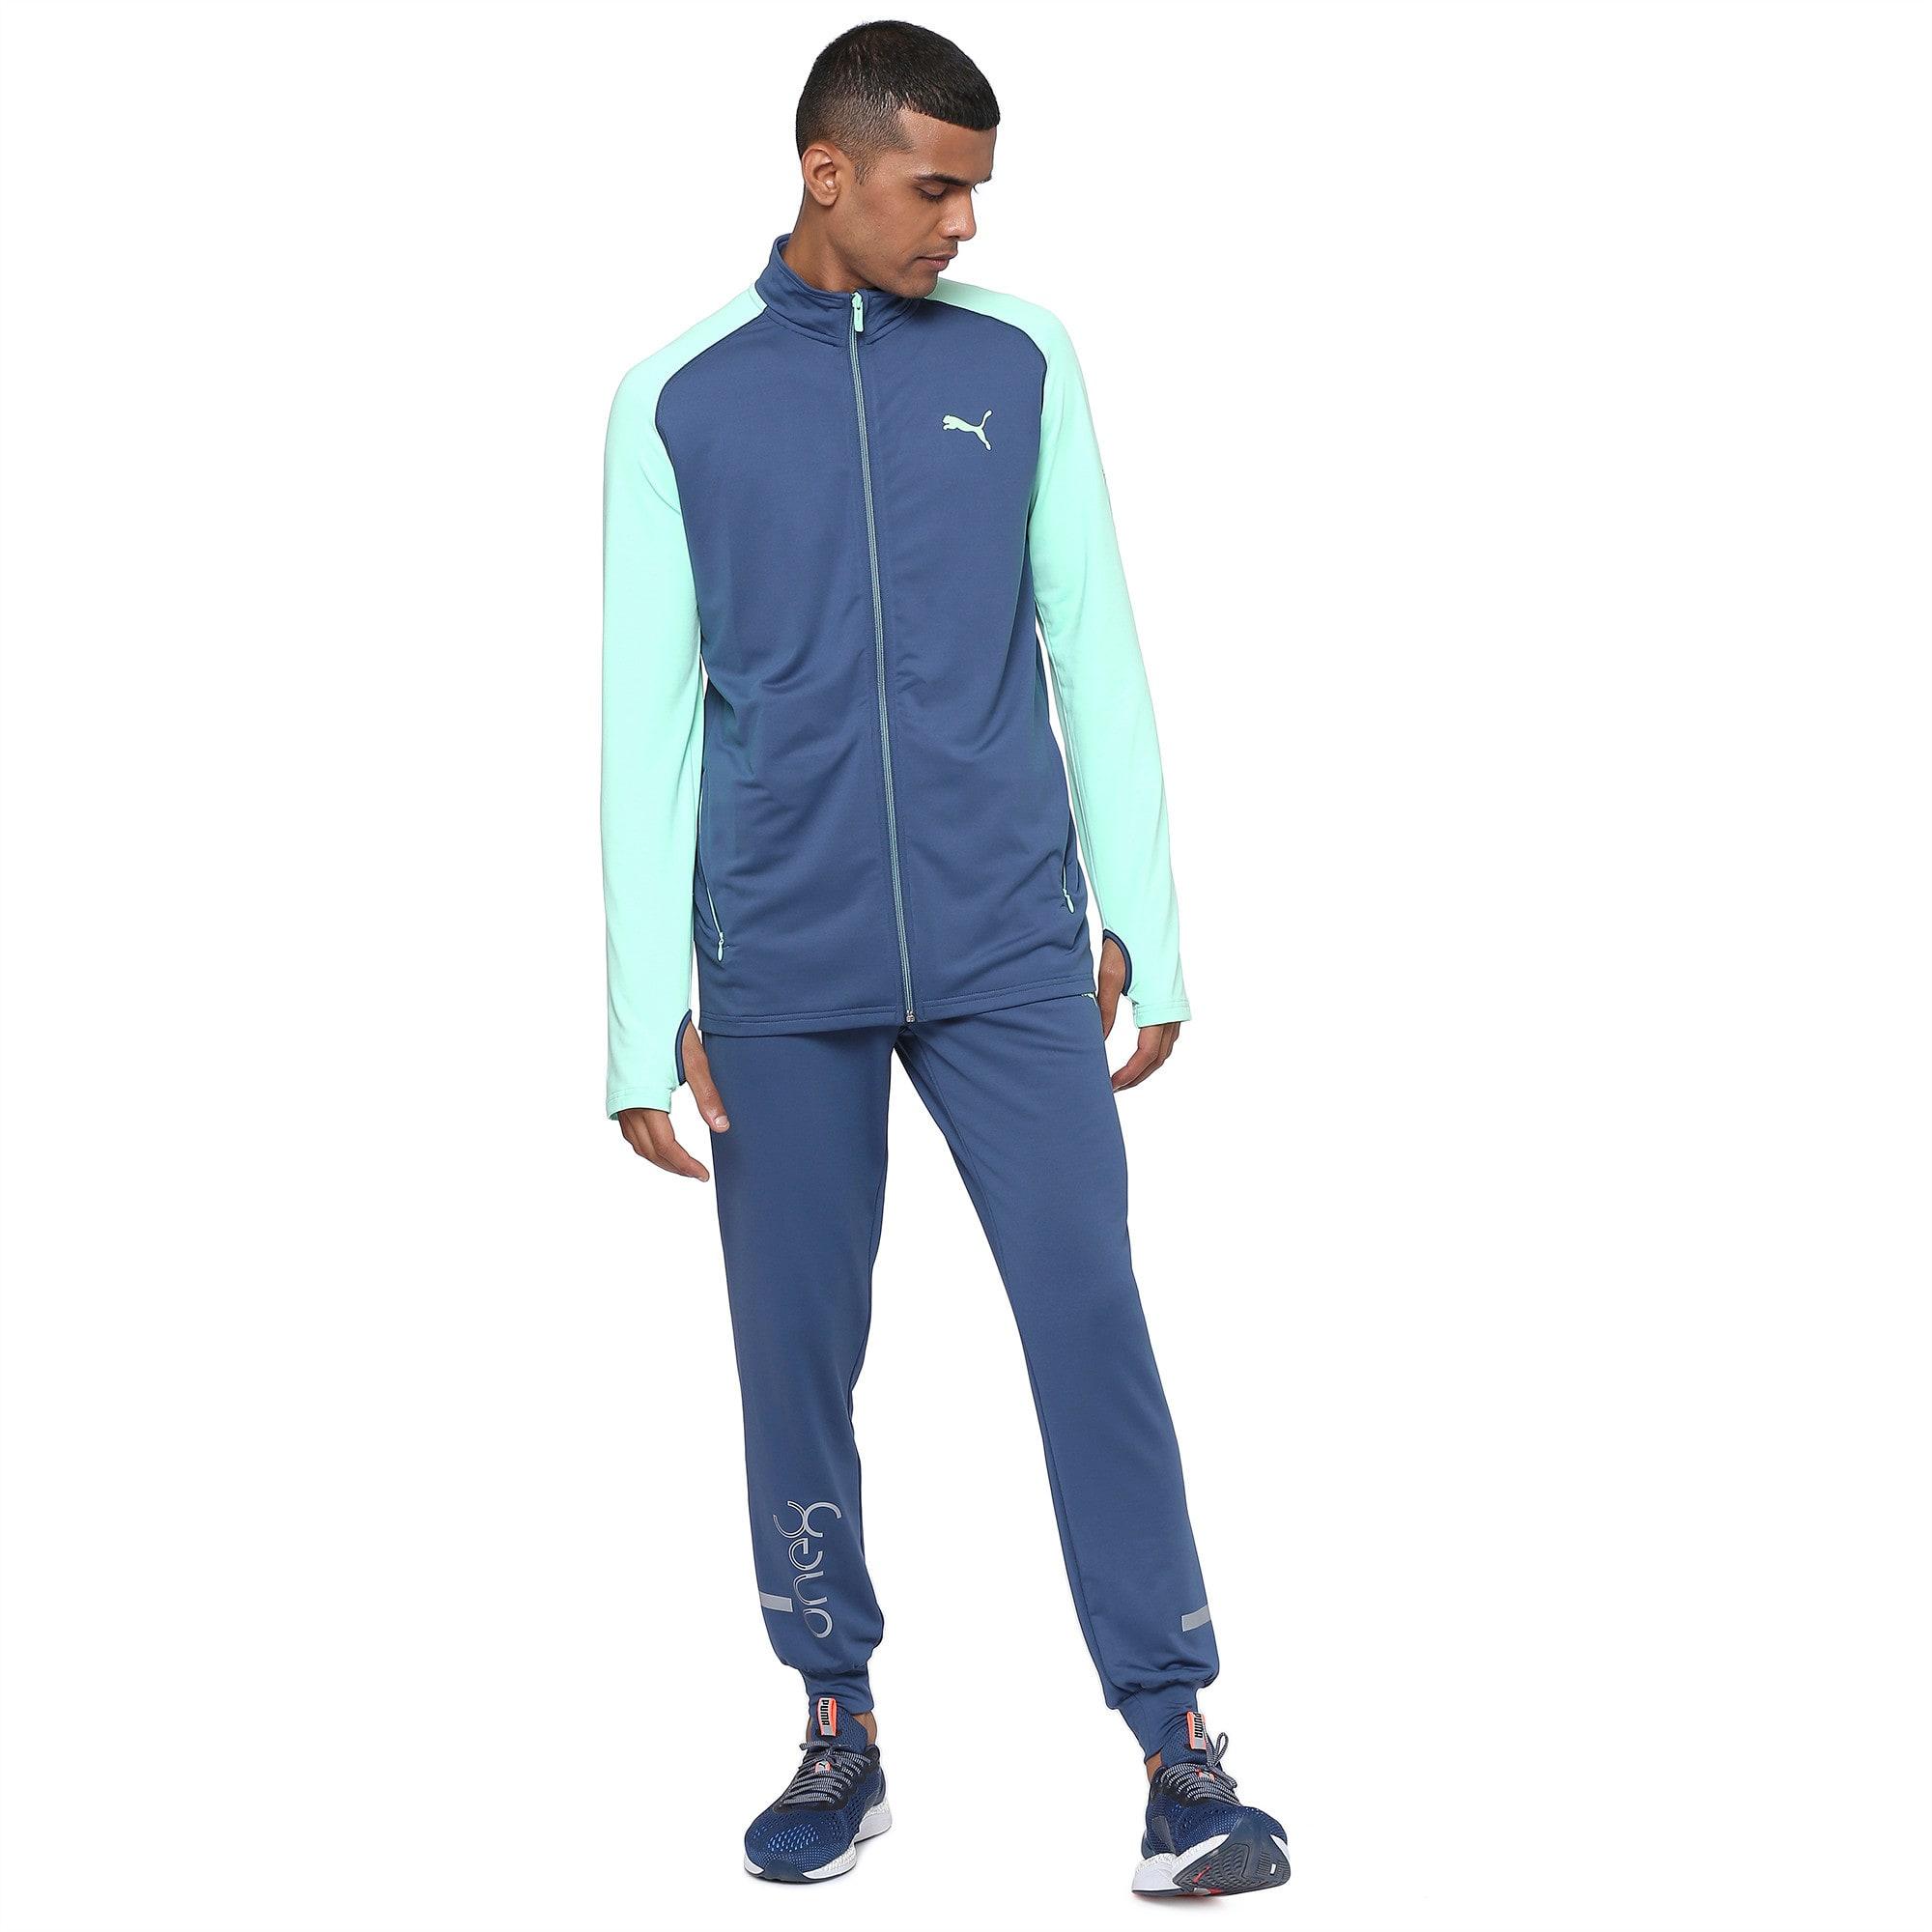 PUMA x Virat Kohli Active Men's Jacket | Dark Denim | PUMA Loungewear | PUMA